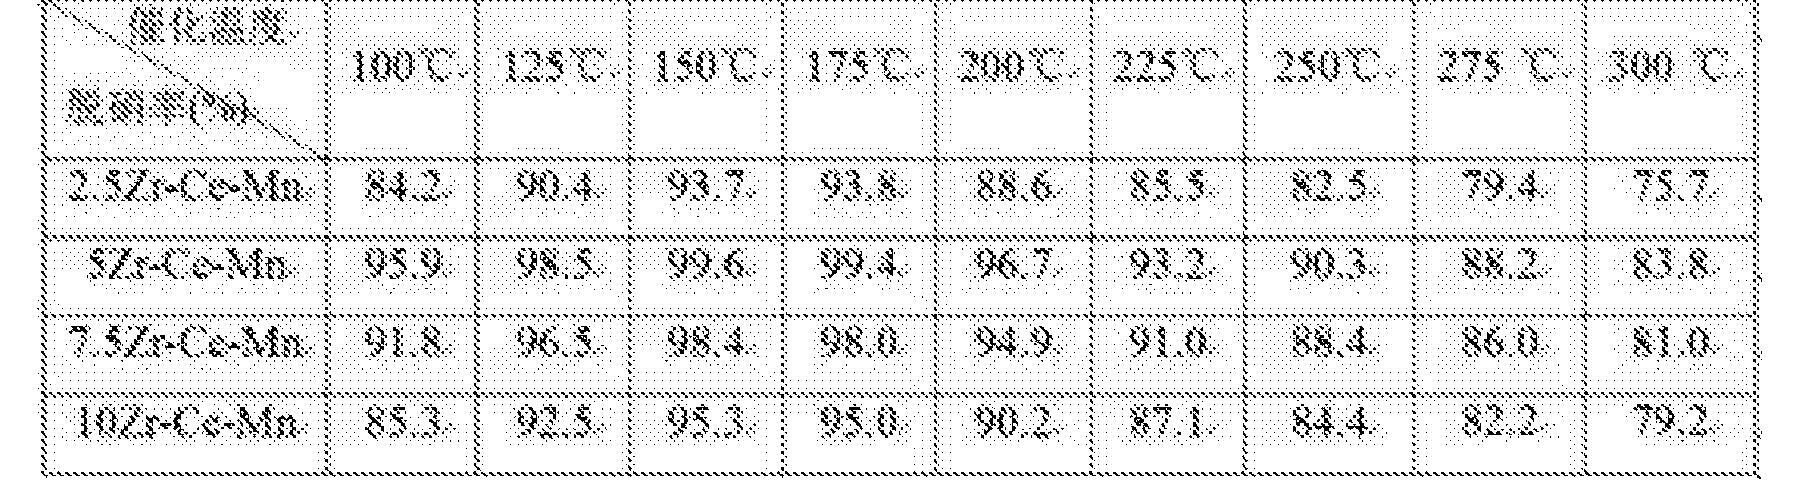 Figure CN106423148AD00041